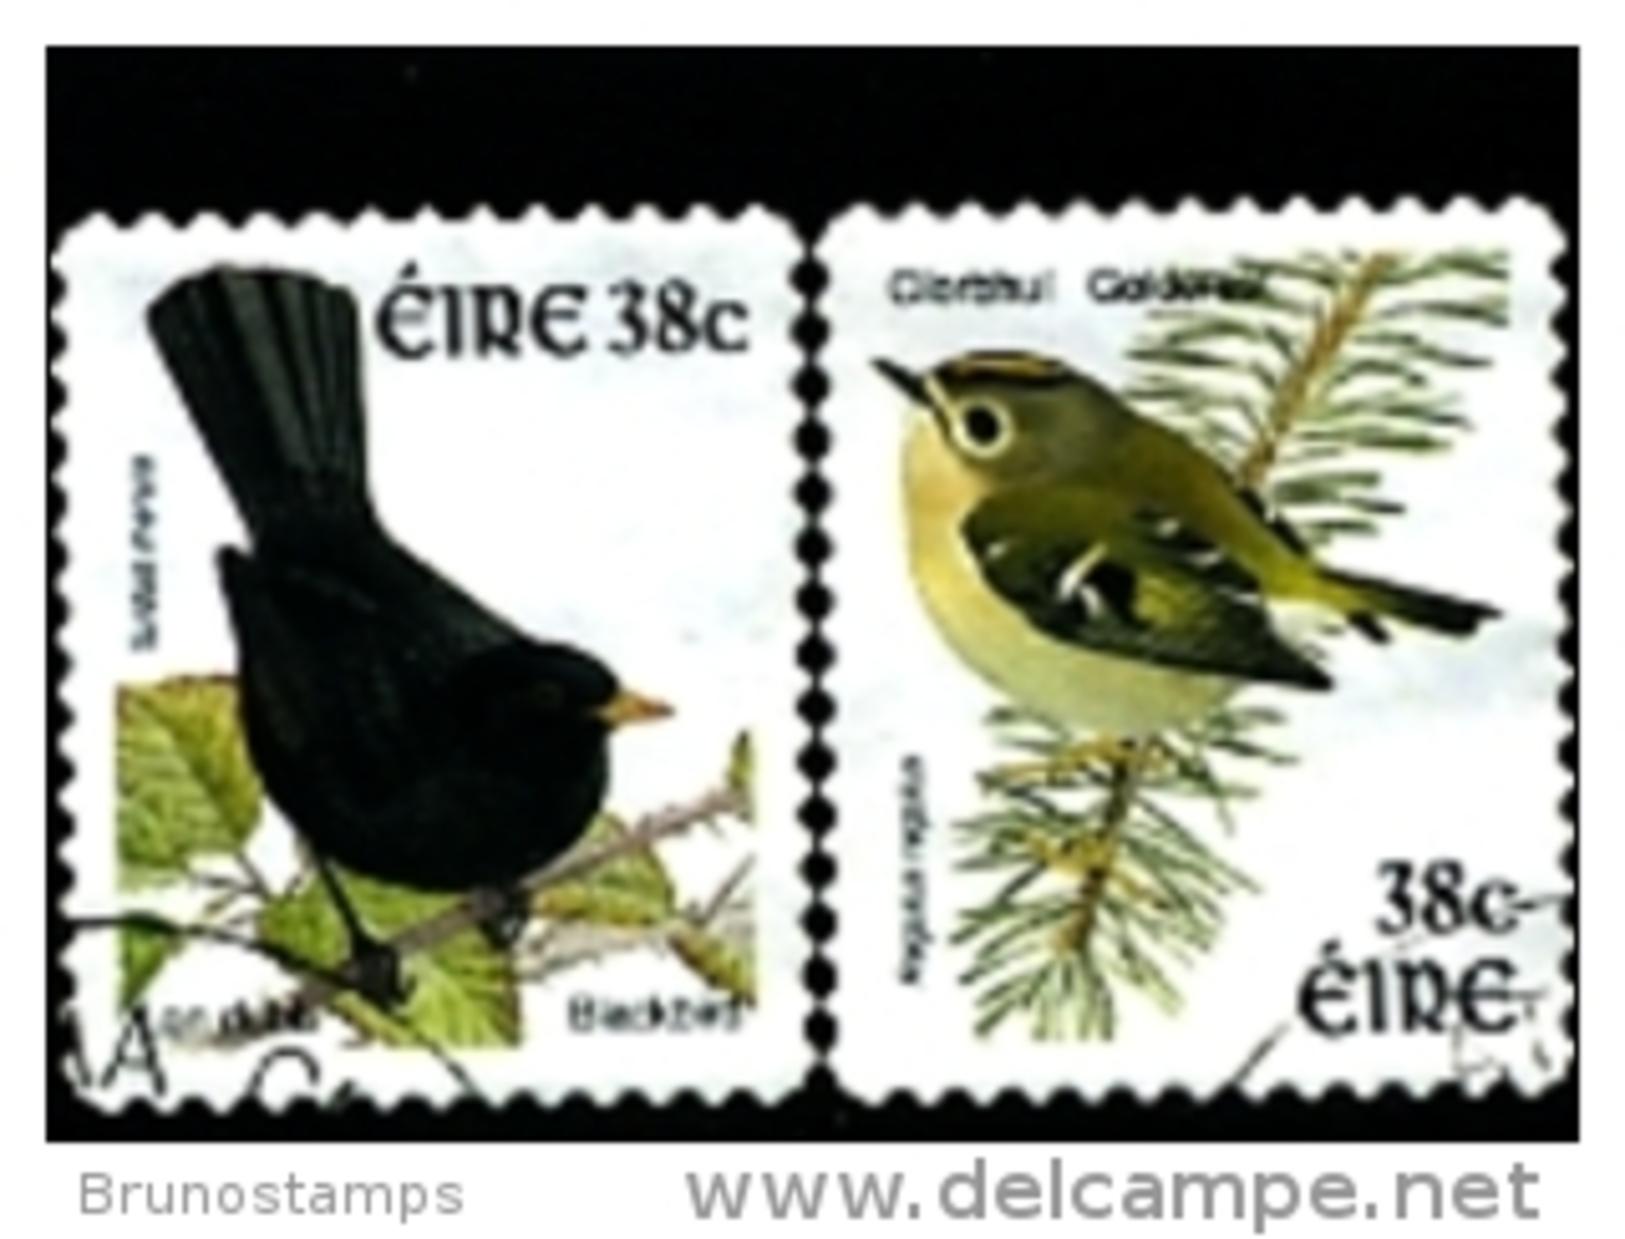 IRELAND/EIRE - 2002  BIRDS  SELF ADHESIVE  SET  FINE USED - 1949-... Repubblica D'Irlanda